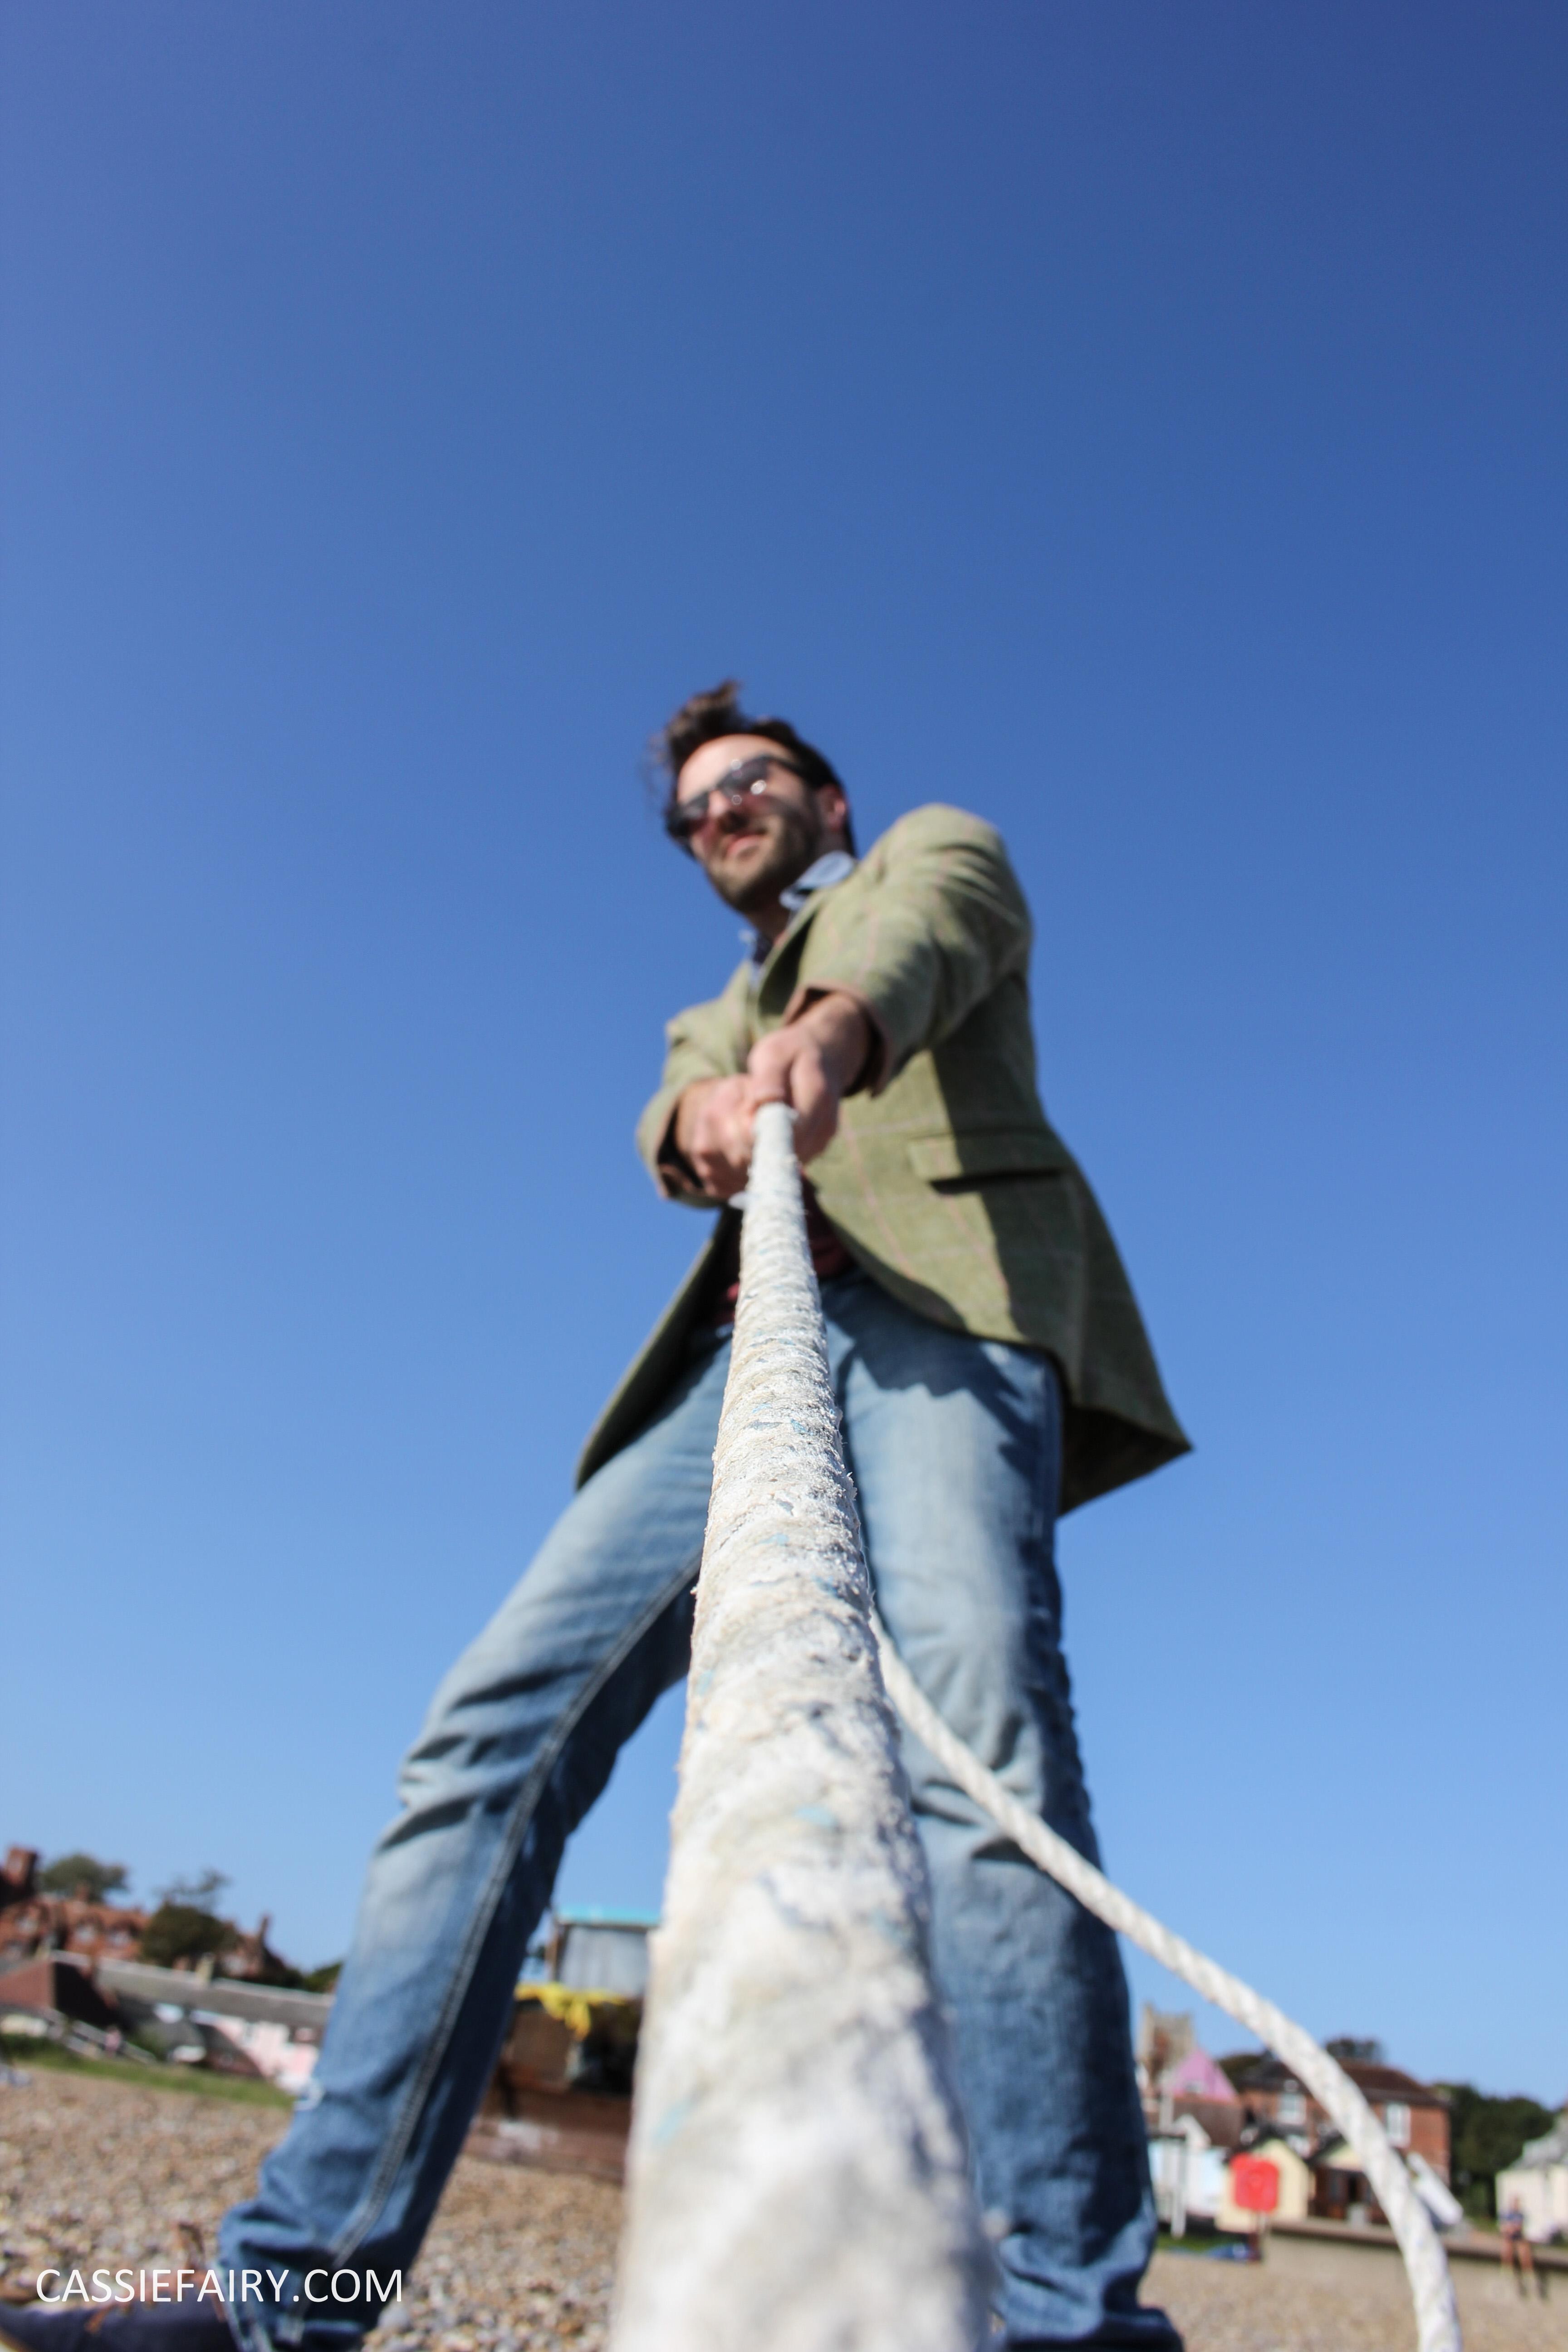 menswear mens fashion styling a tweed jacket casual beach autumn winter-21